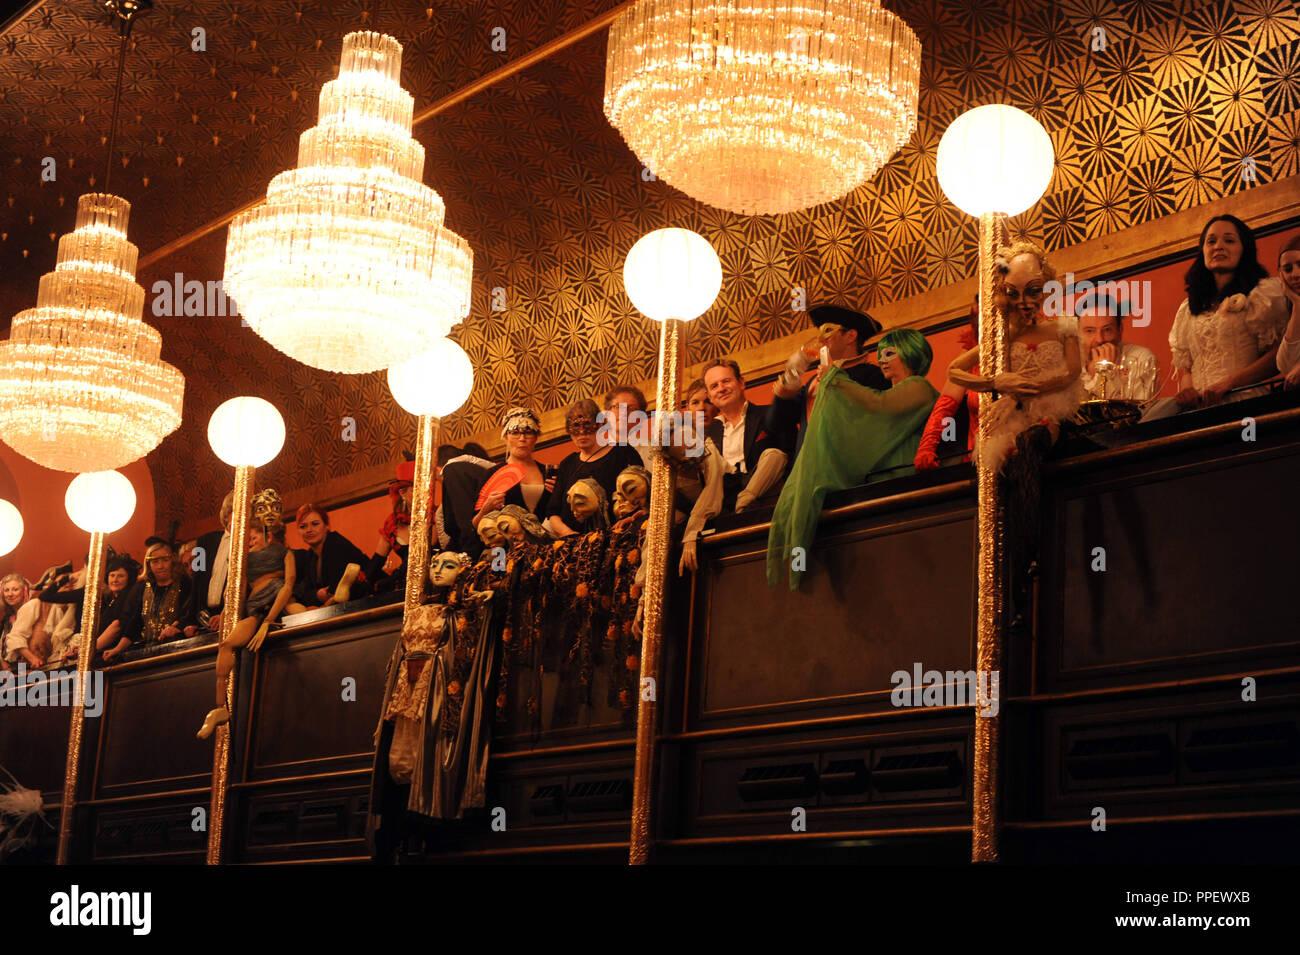 Gallery at the Gauklerball (Juggler's Ball) in the Kuenstlerhaus in Munich. - Stock Image